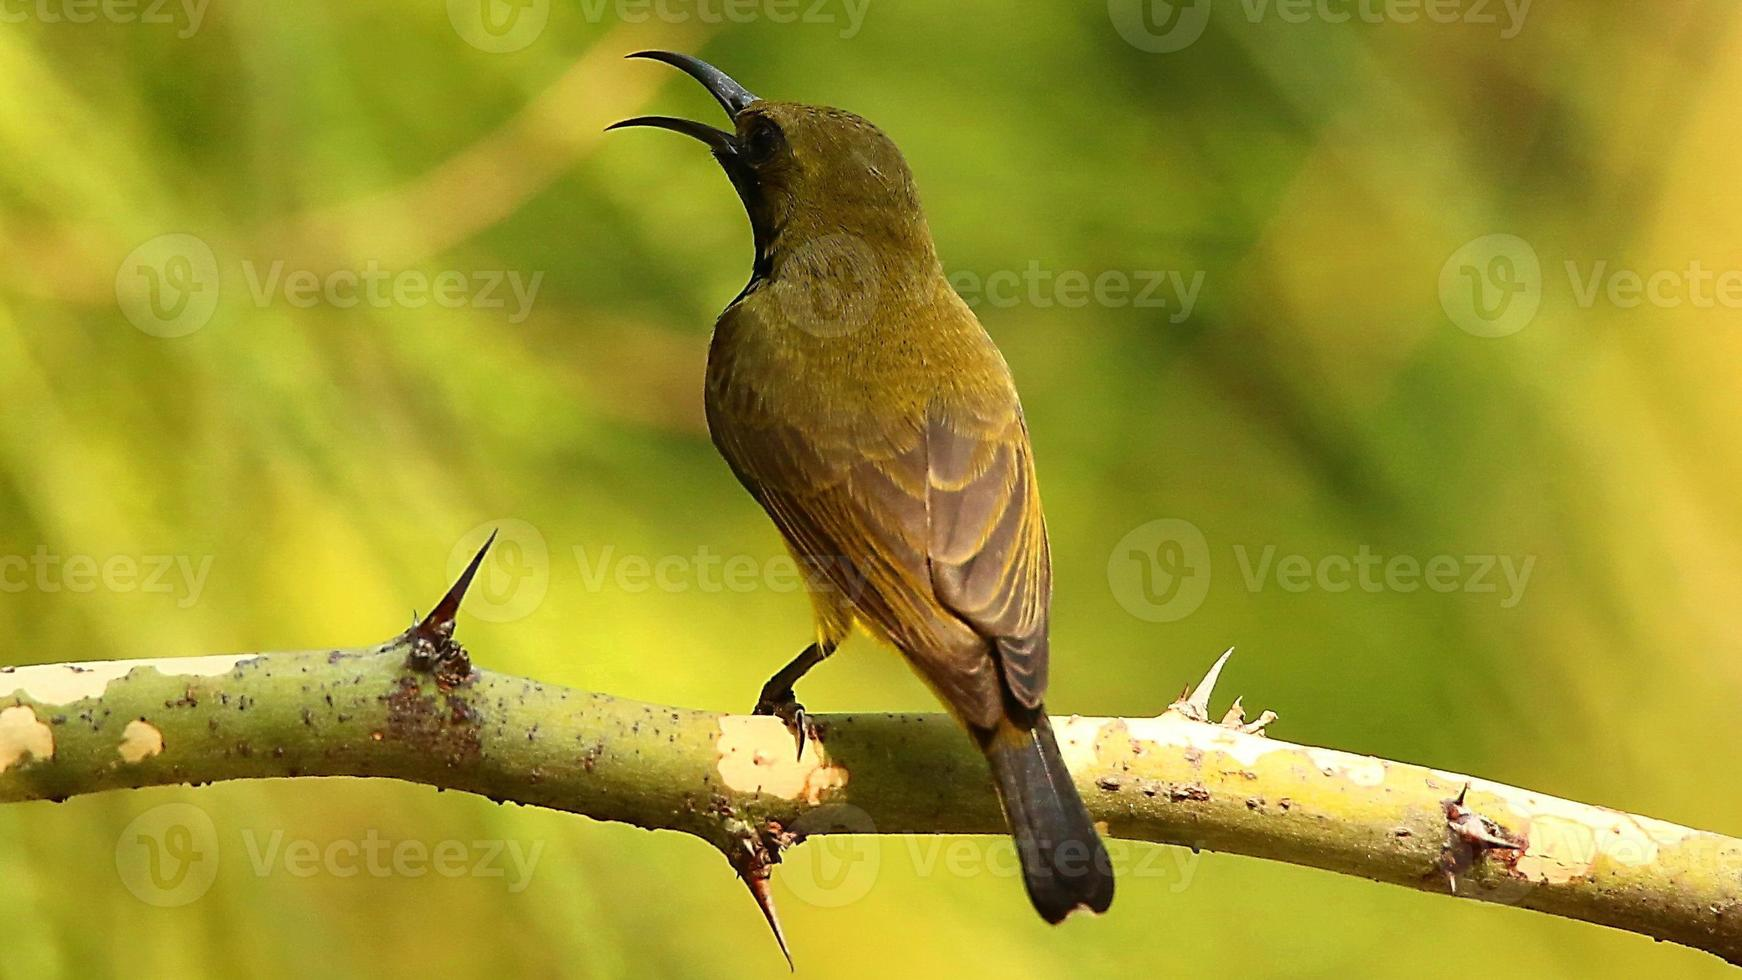 Male Olive-backed Sunbird Resting on Tree photo